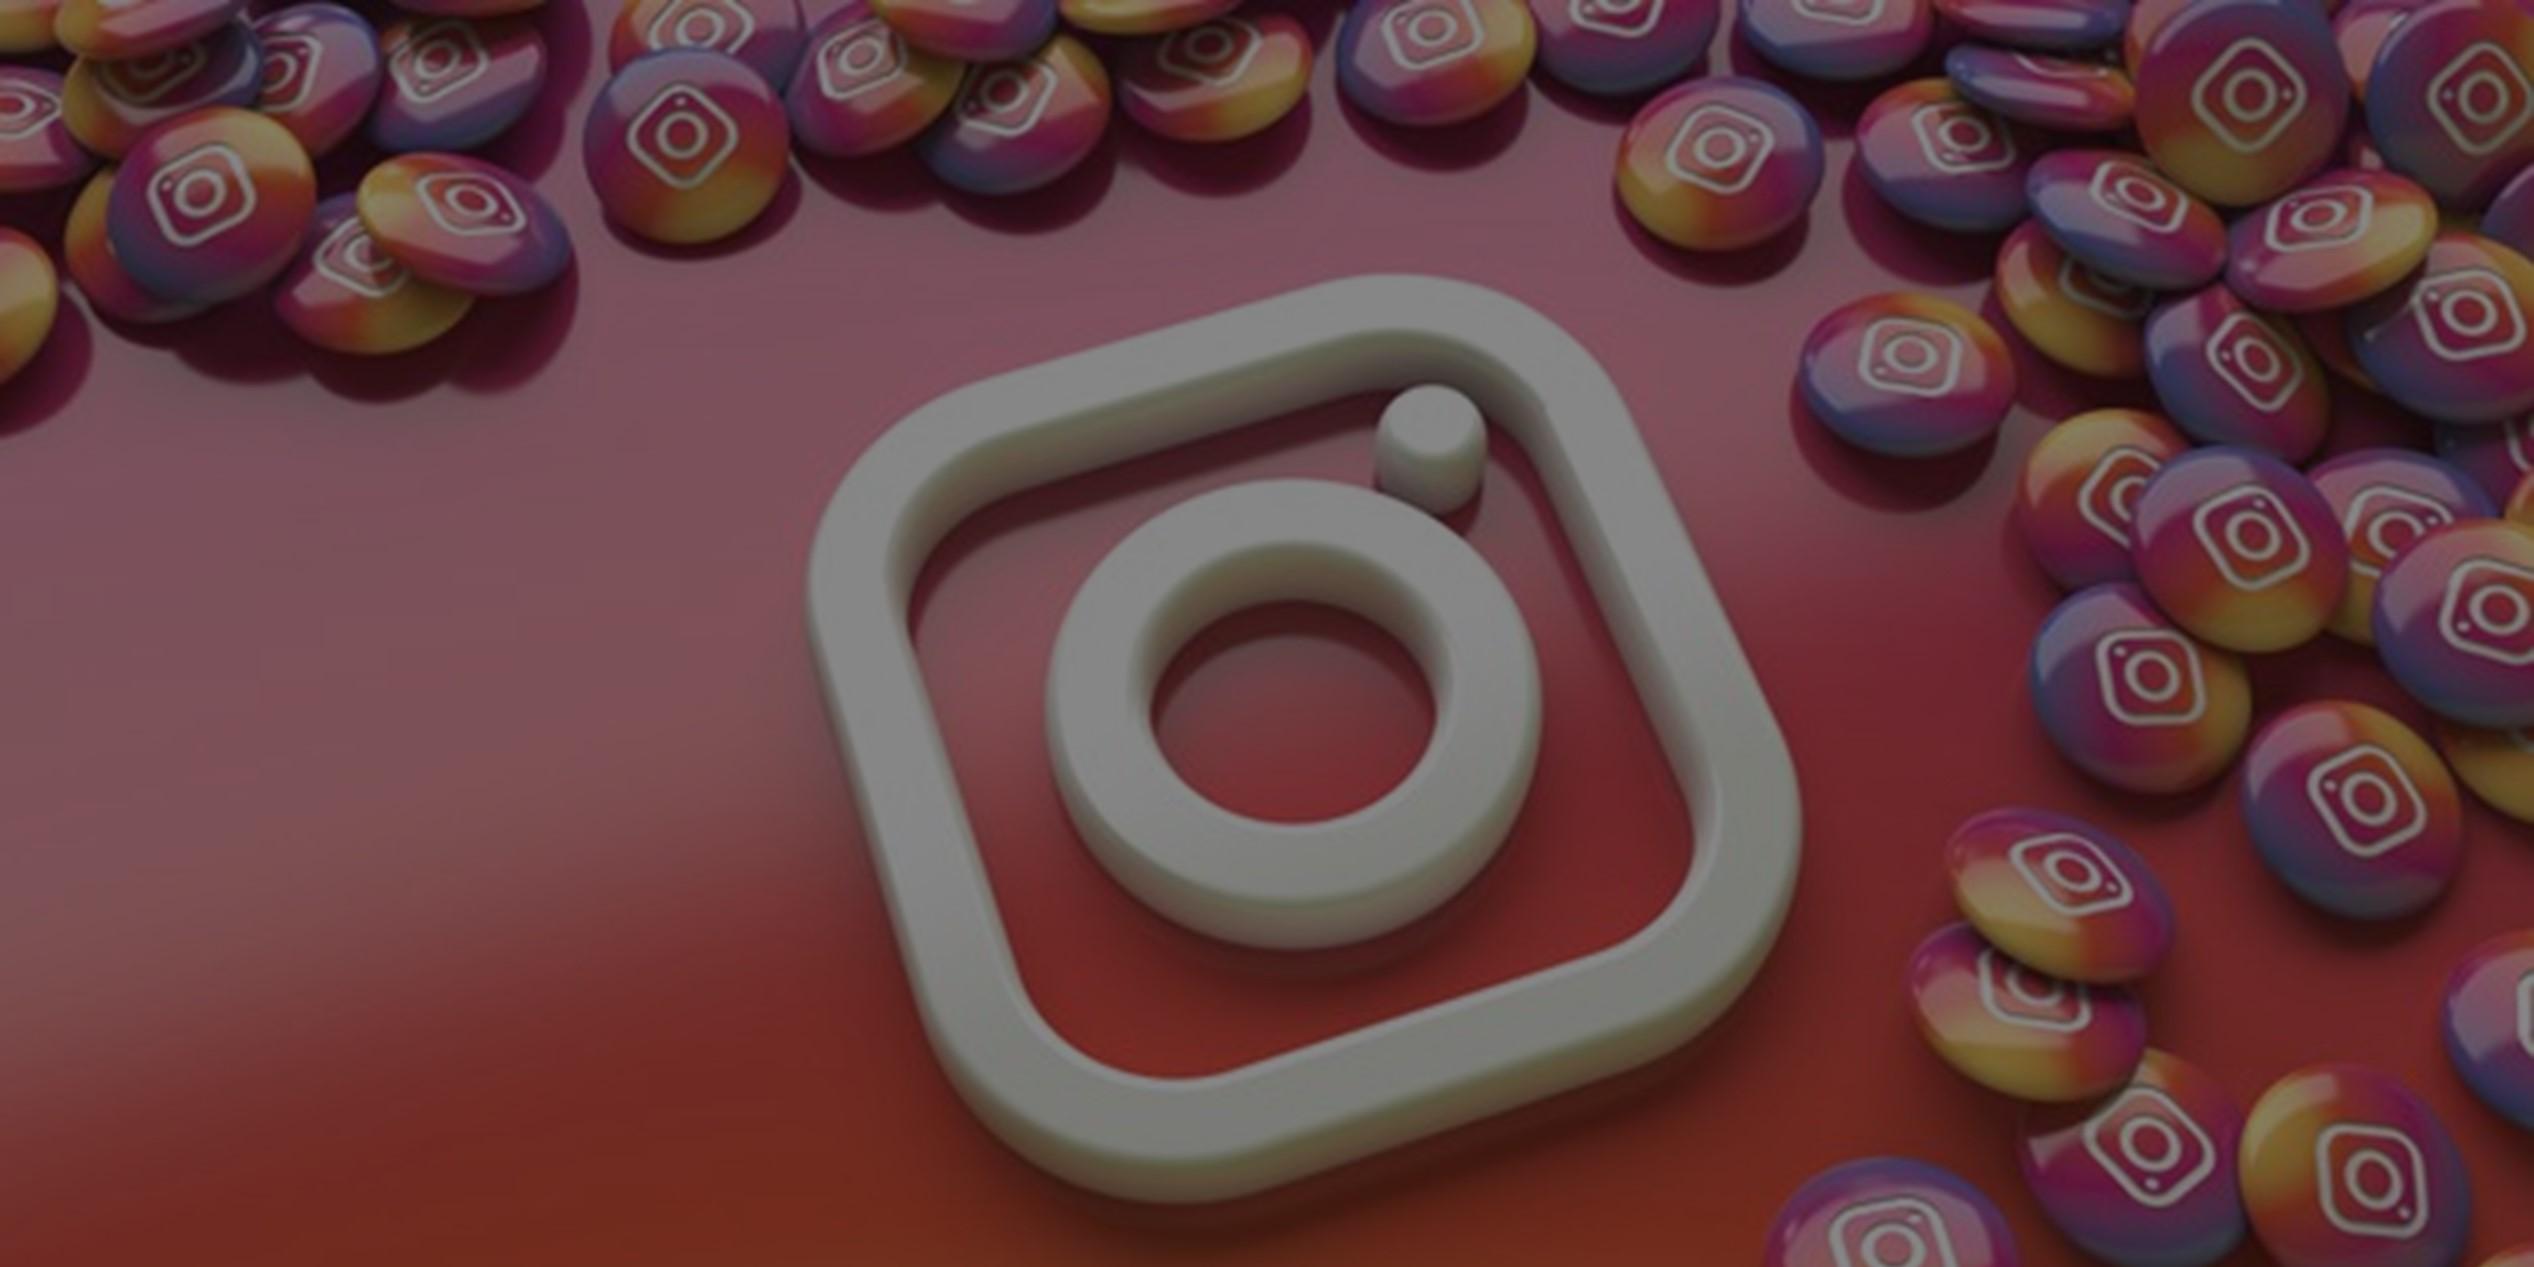 Engagement-Instagram-hashtag-Likes-me-encanta-interaccion-followers-respost-lima-Peru